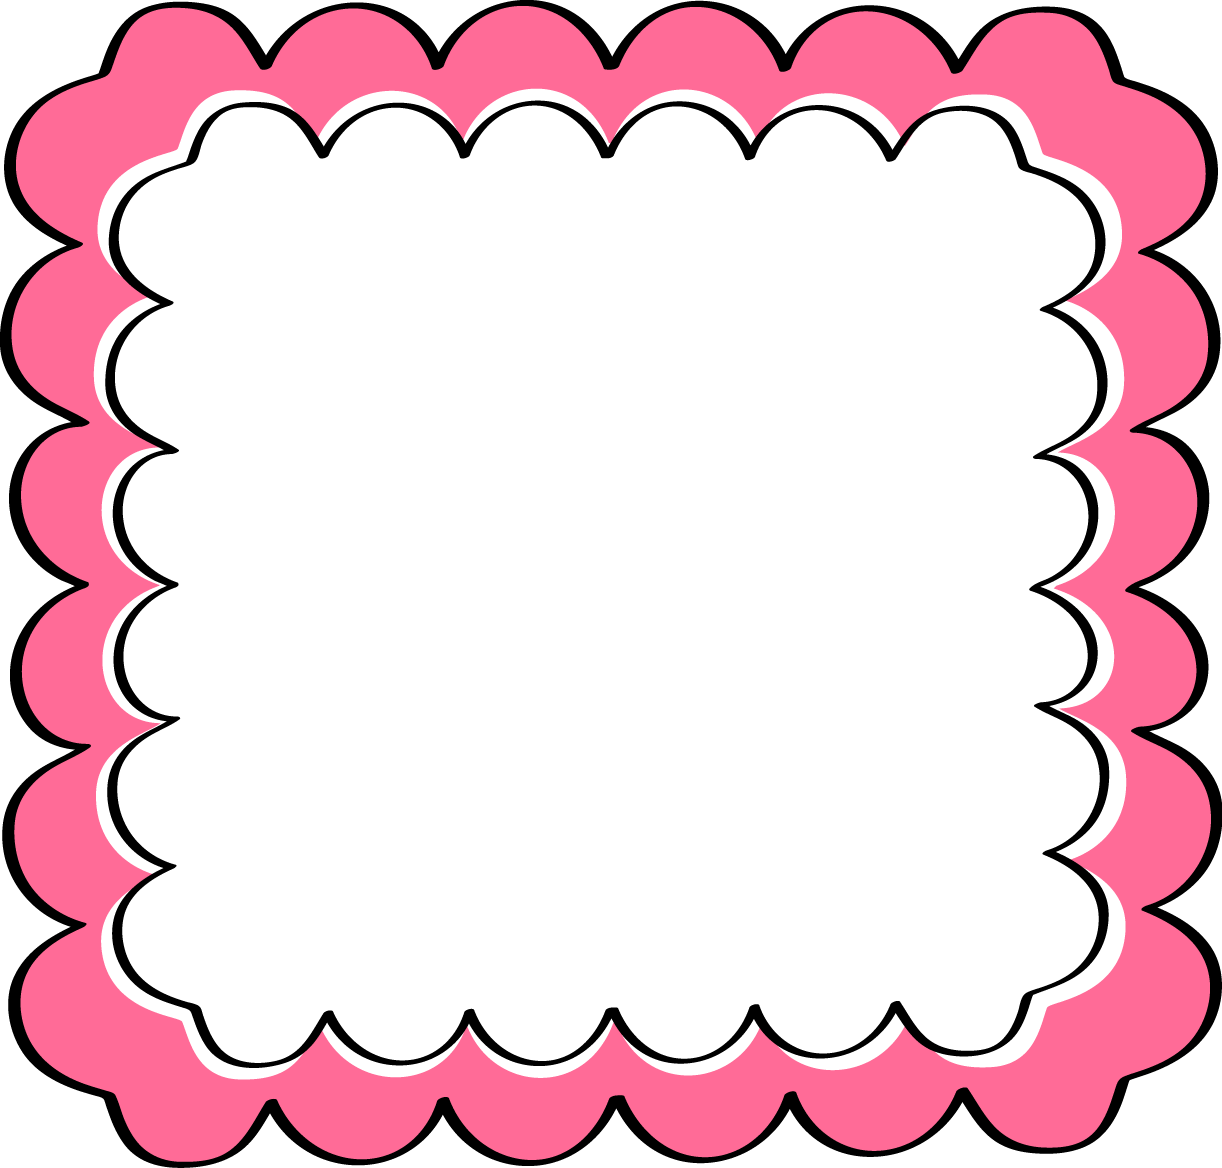 Frames Clip Art - Cliparts.co